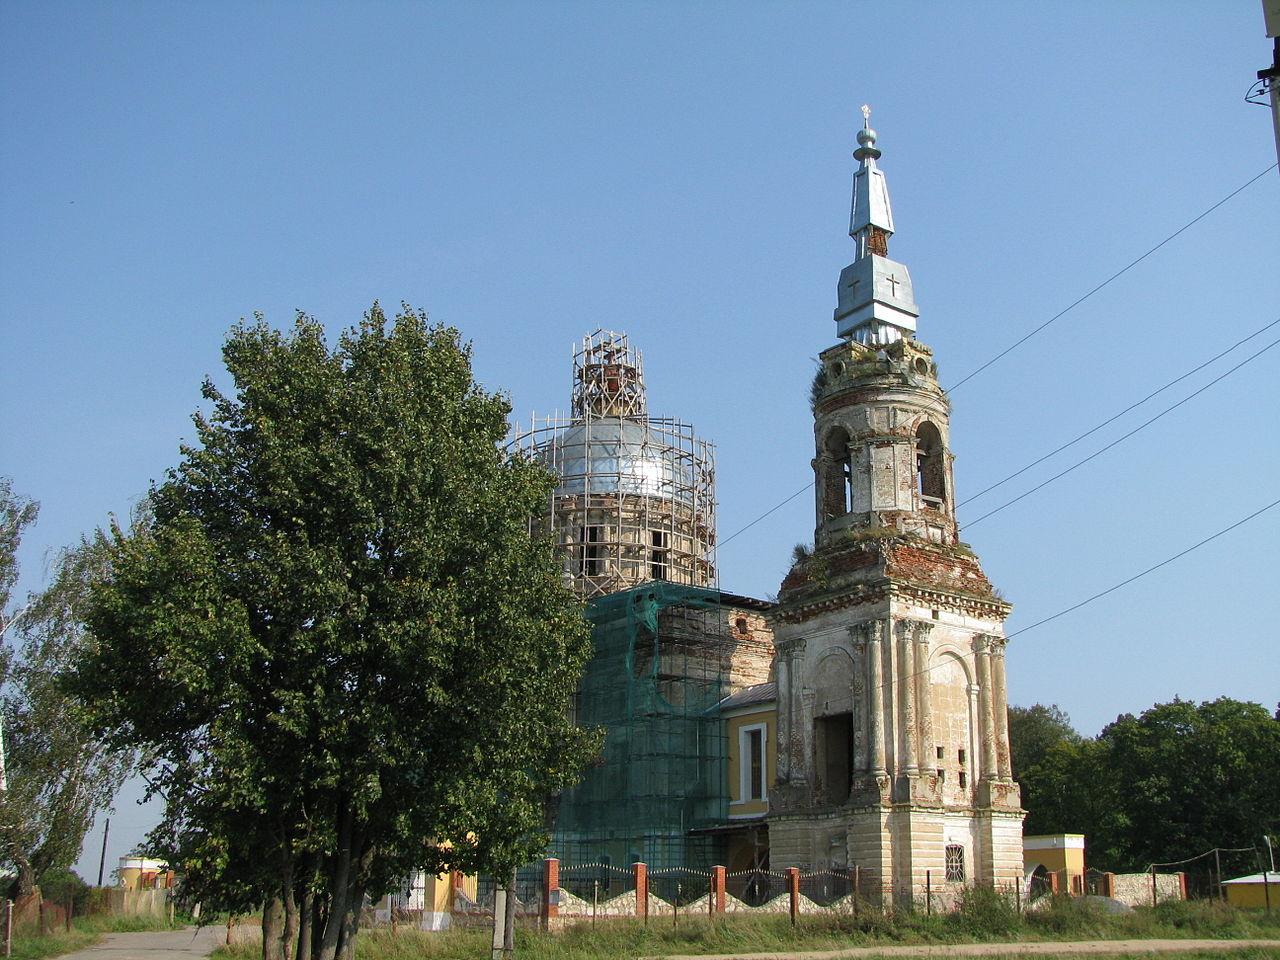 Усадьба Рай-Семеновское, храм Спаса Нерукотворного